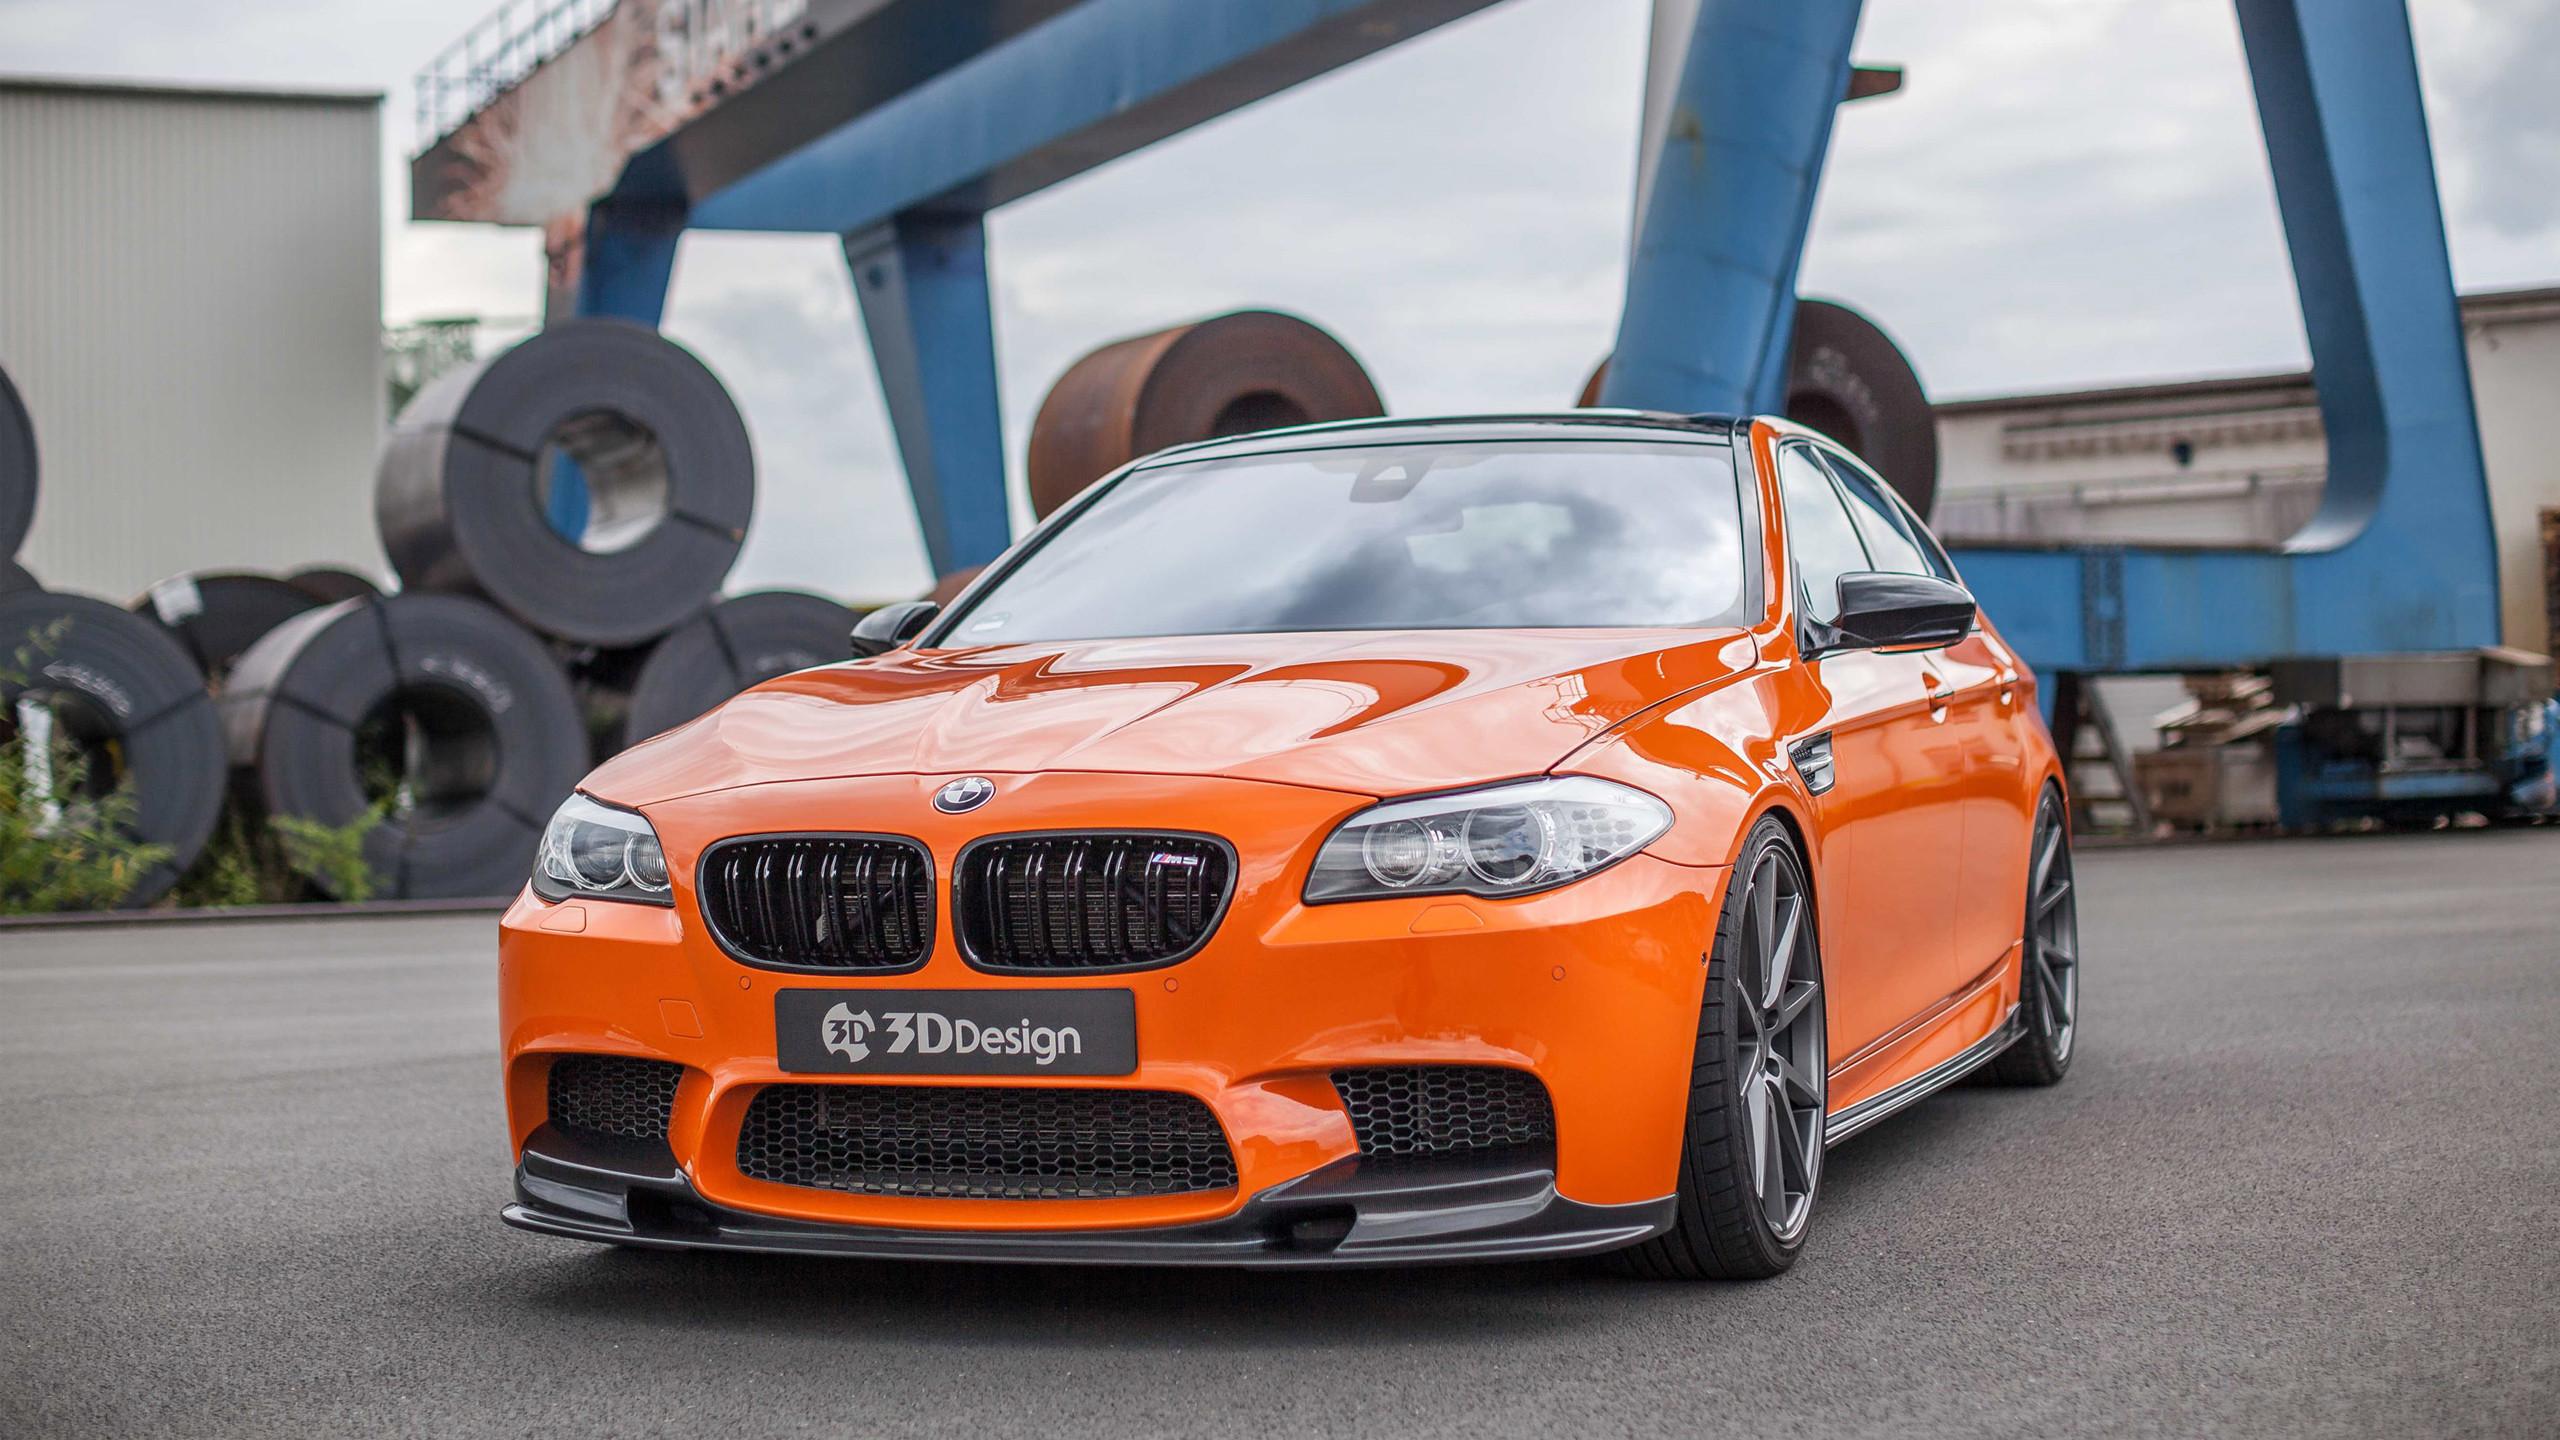 Charmant 1920x1080 BMW M5 E60 Crystal City Car 2014 Blue